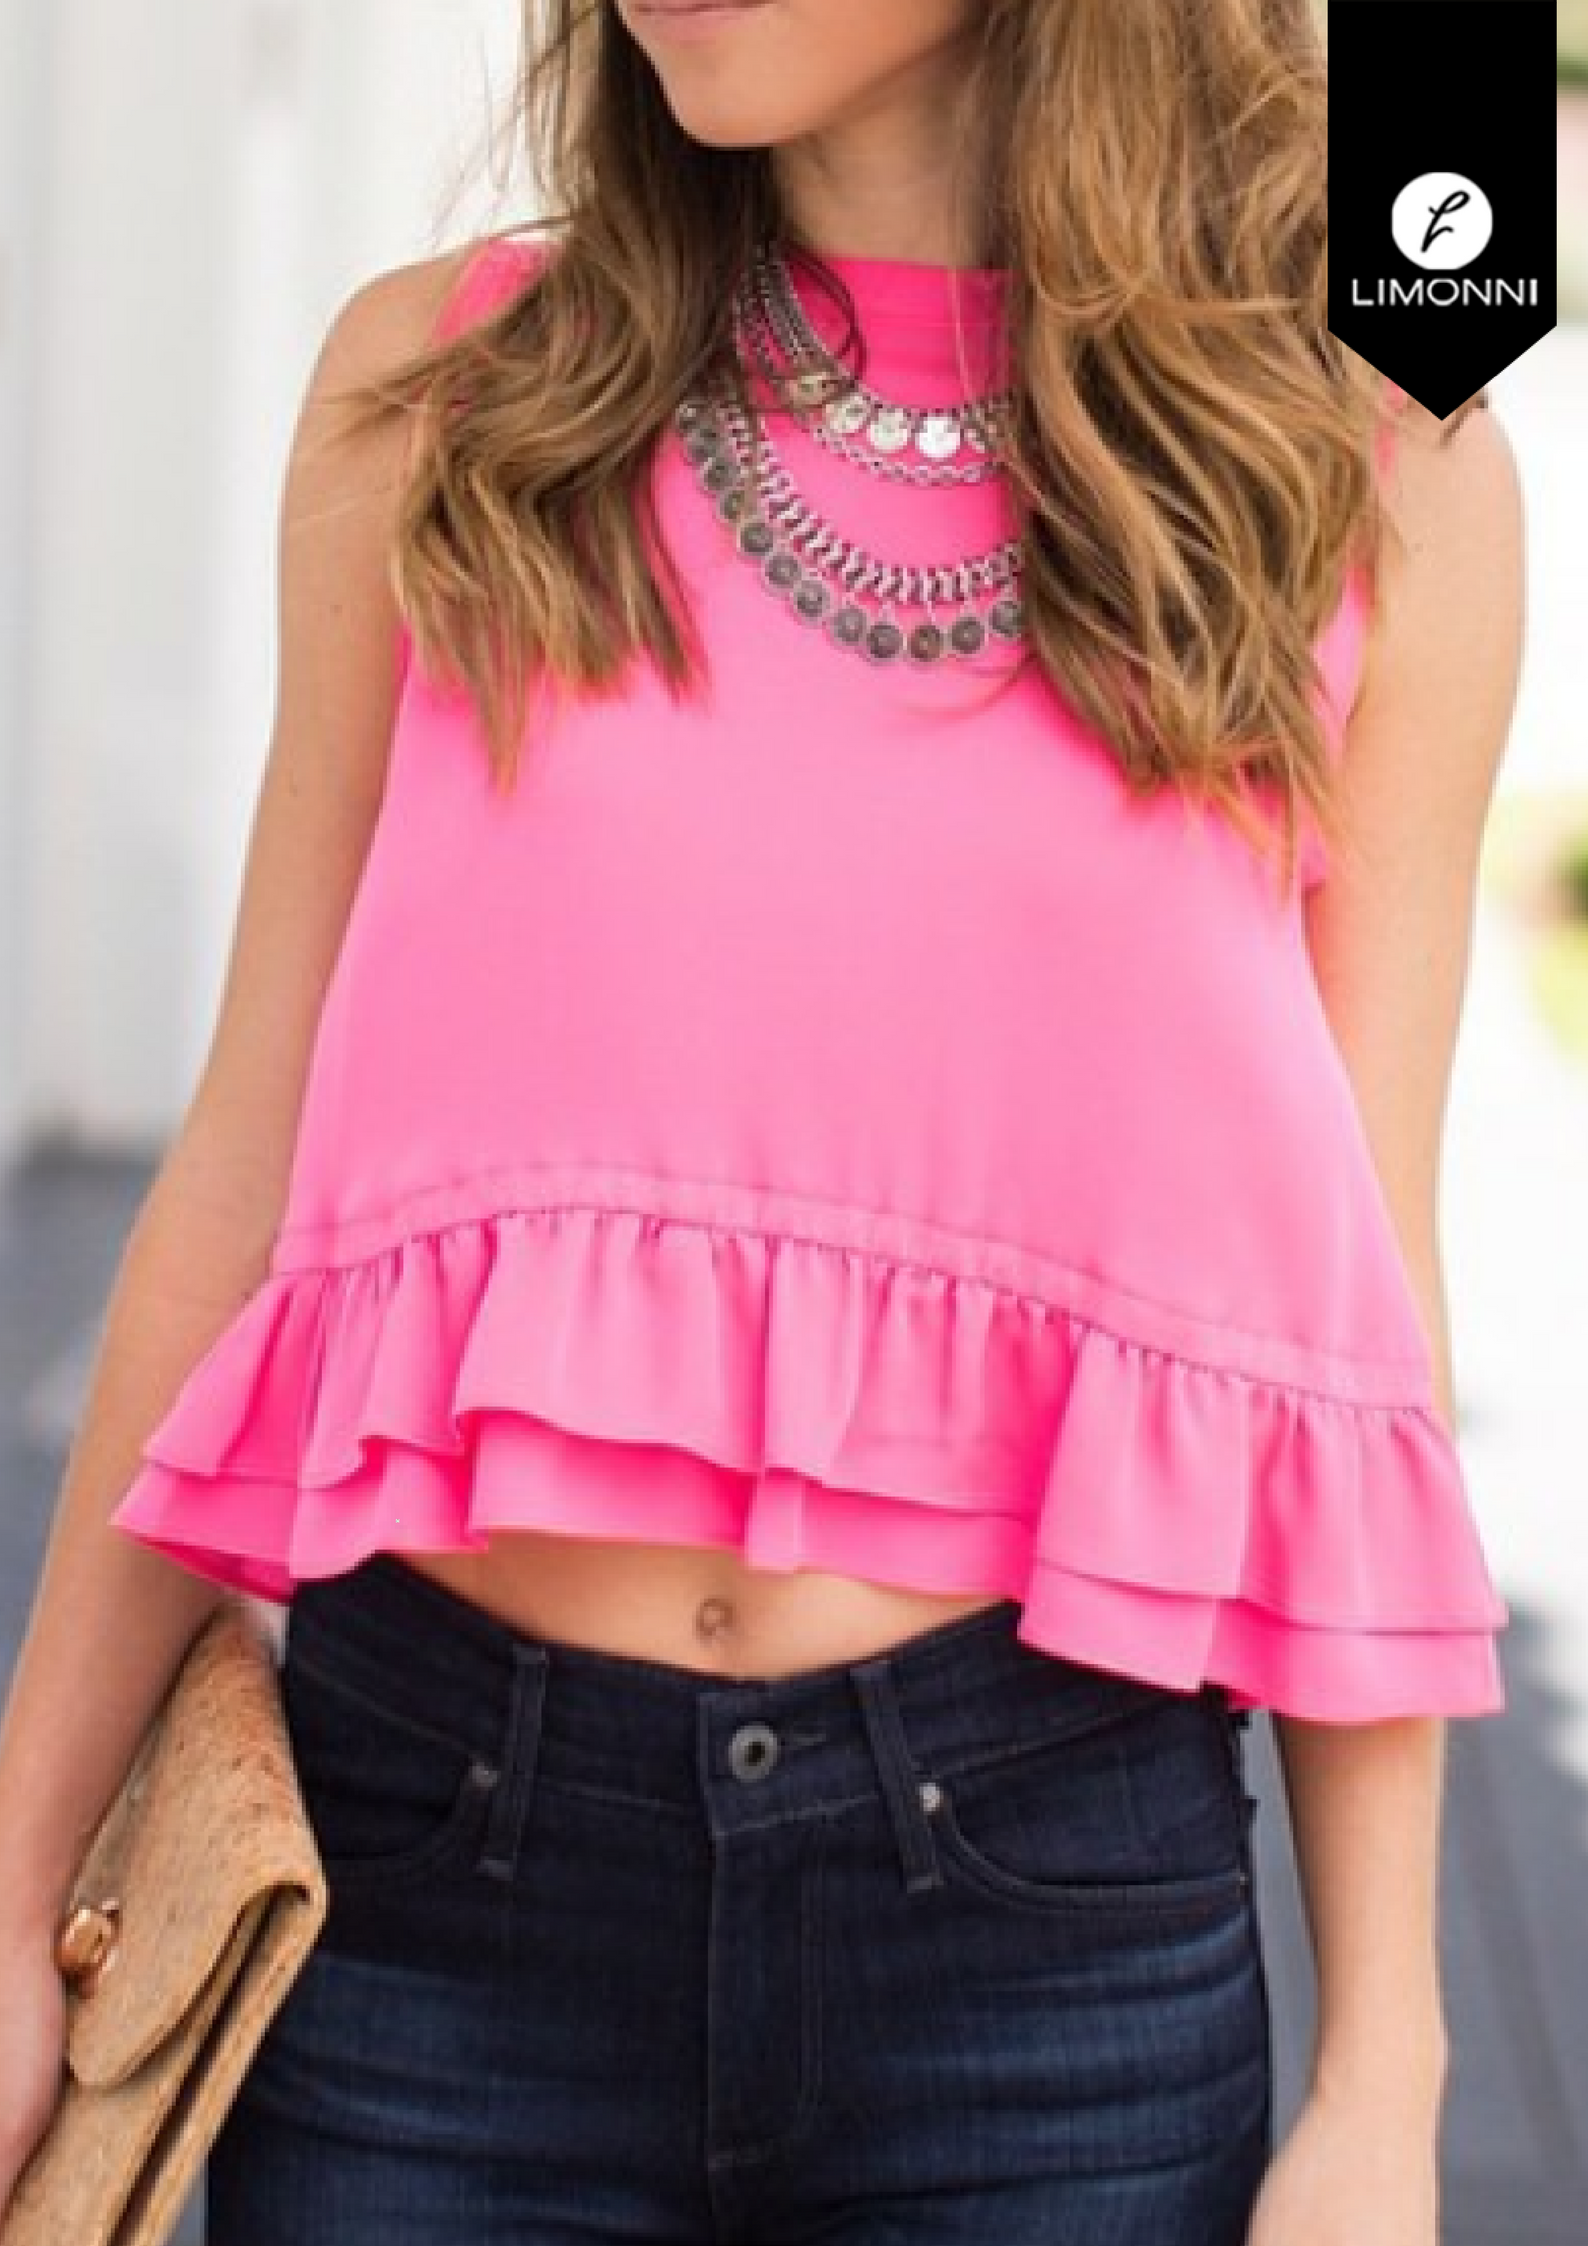 Blusas para mujer Limonni Bennett LI1329 Casuales